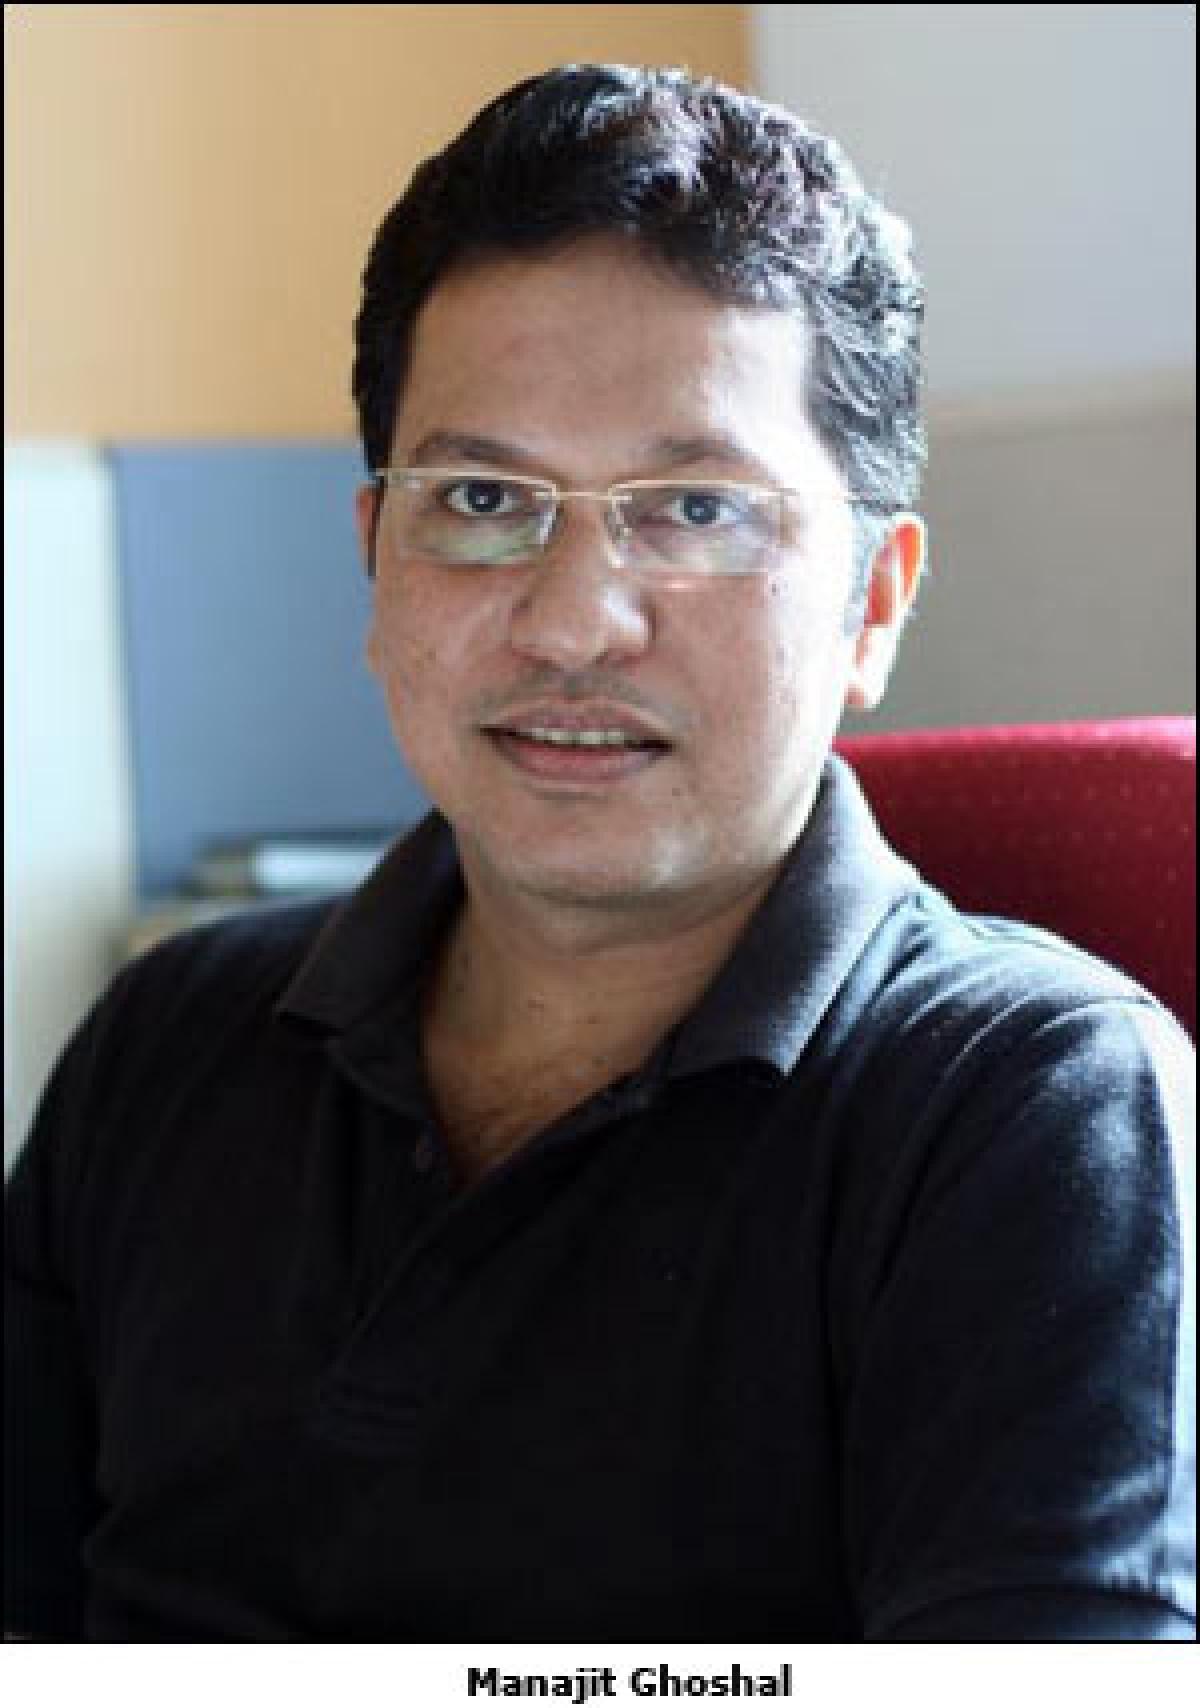 Manajit Ghoshal launches Media Lounge